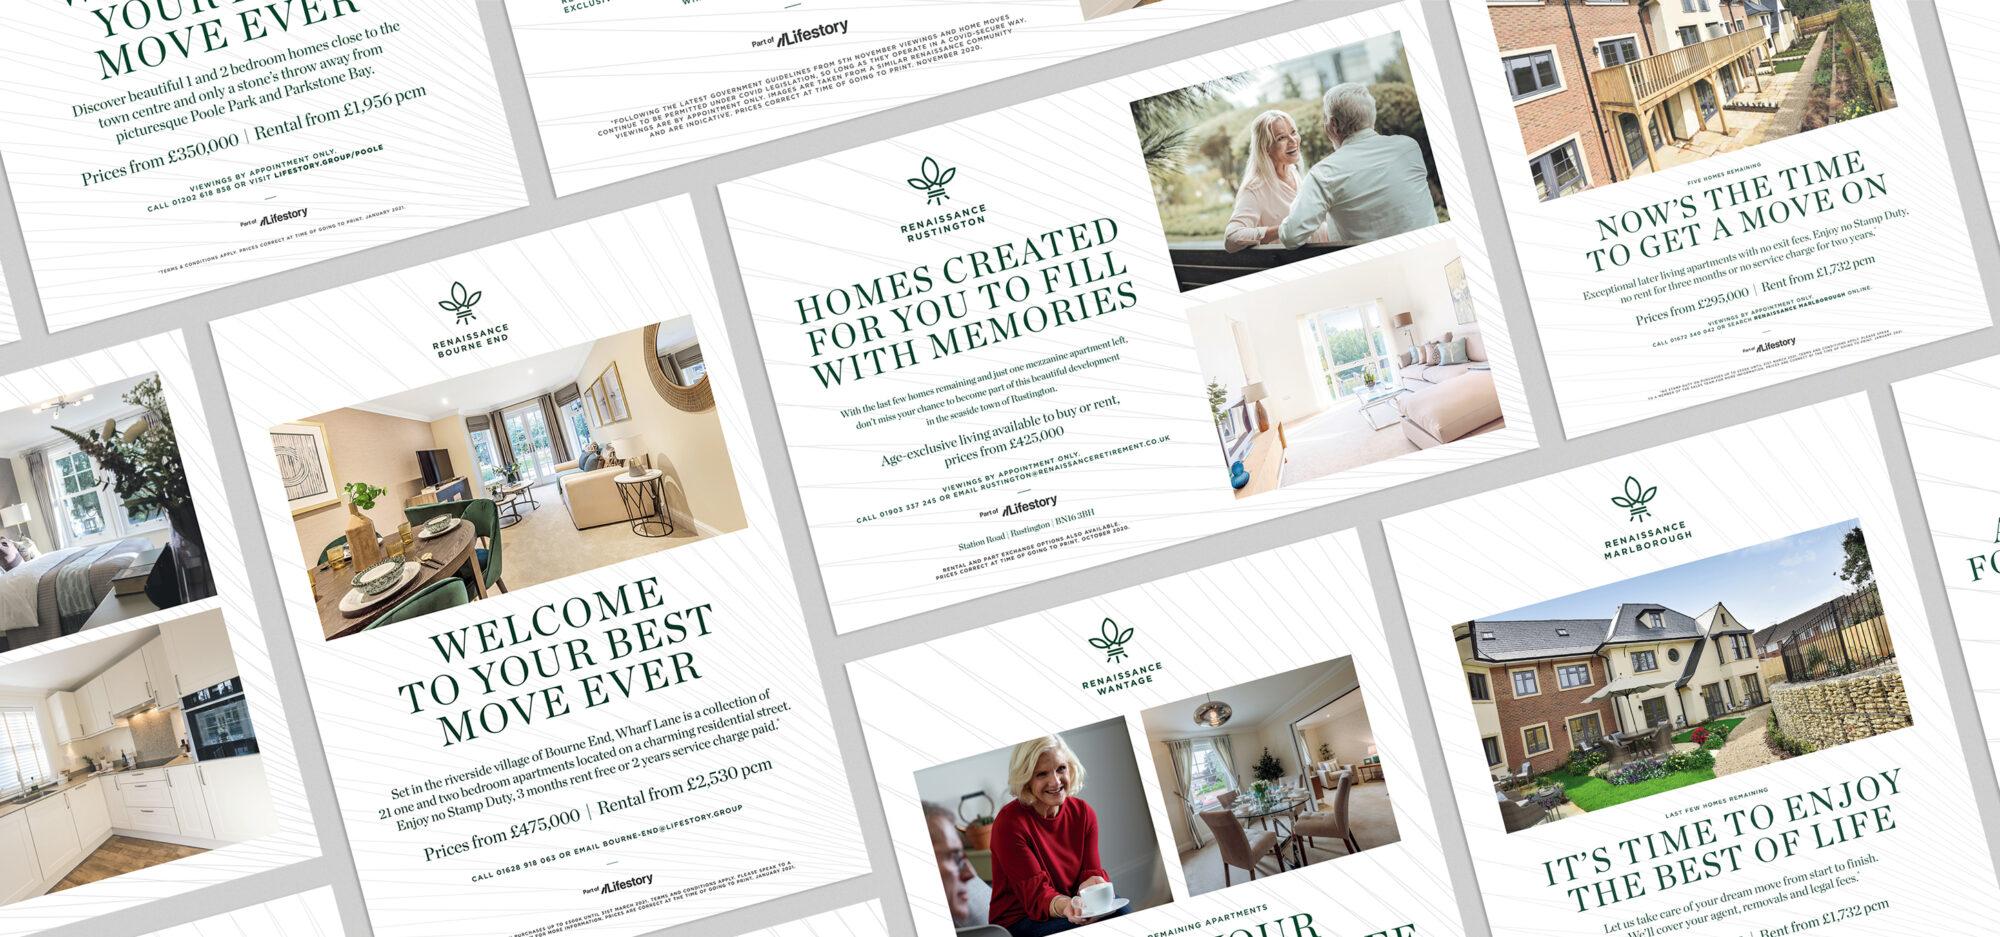 lifestory renaissance press adverts